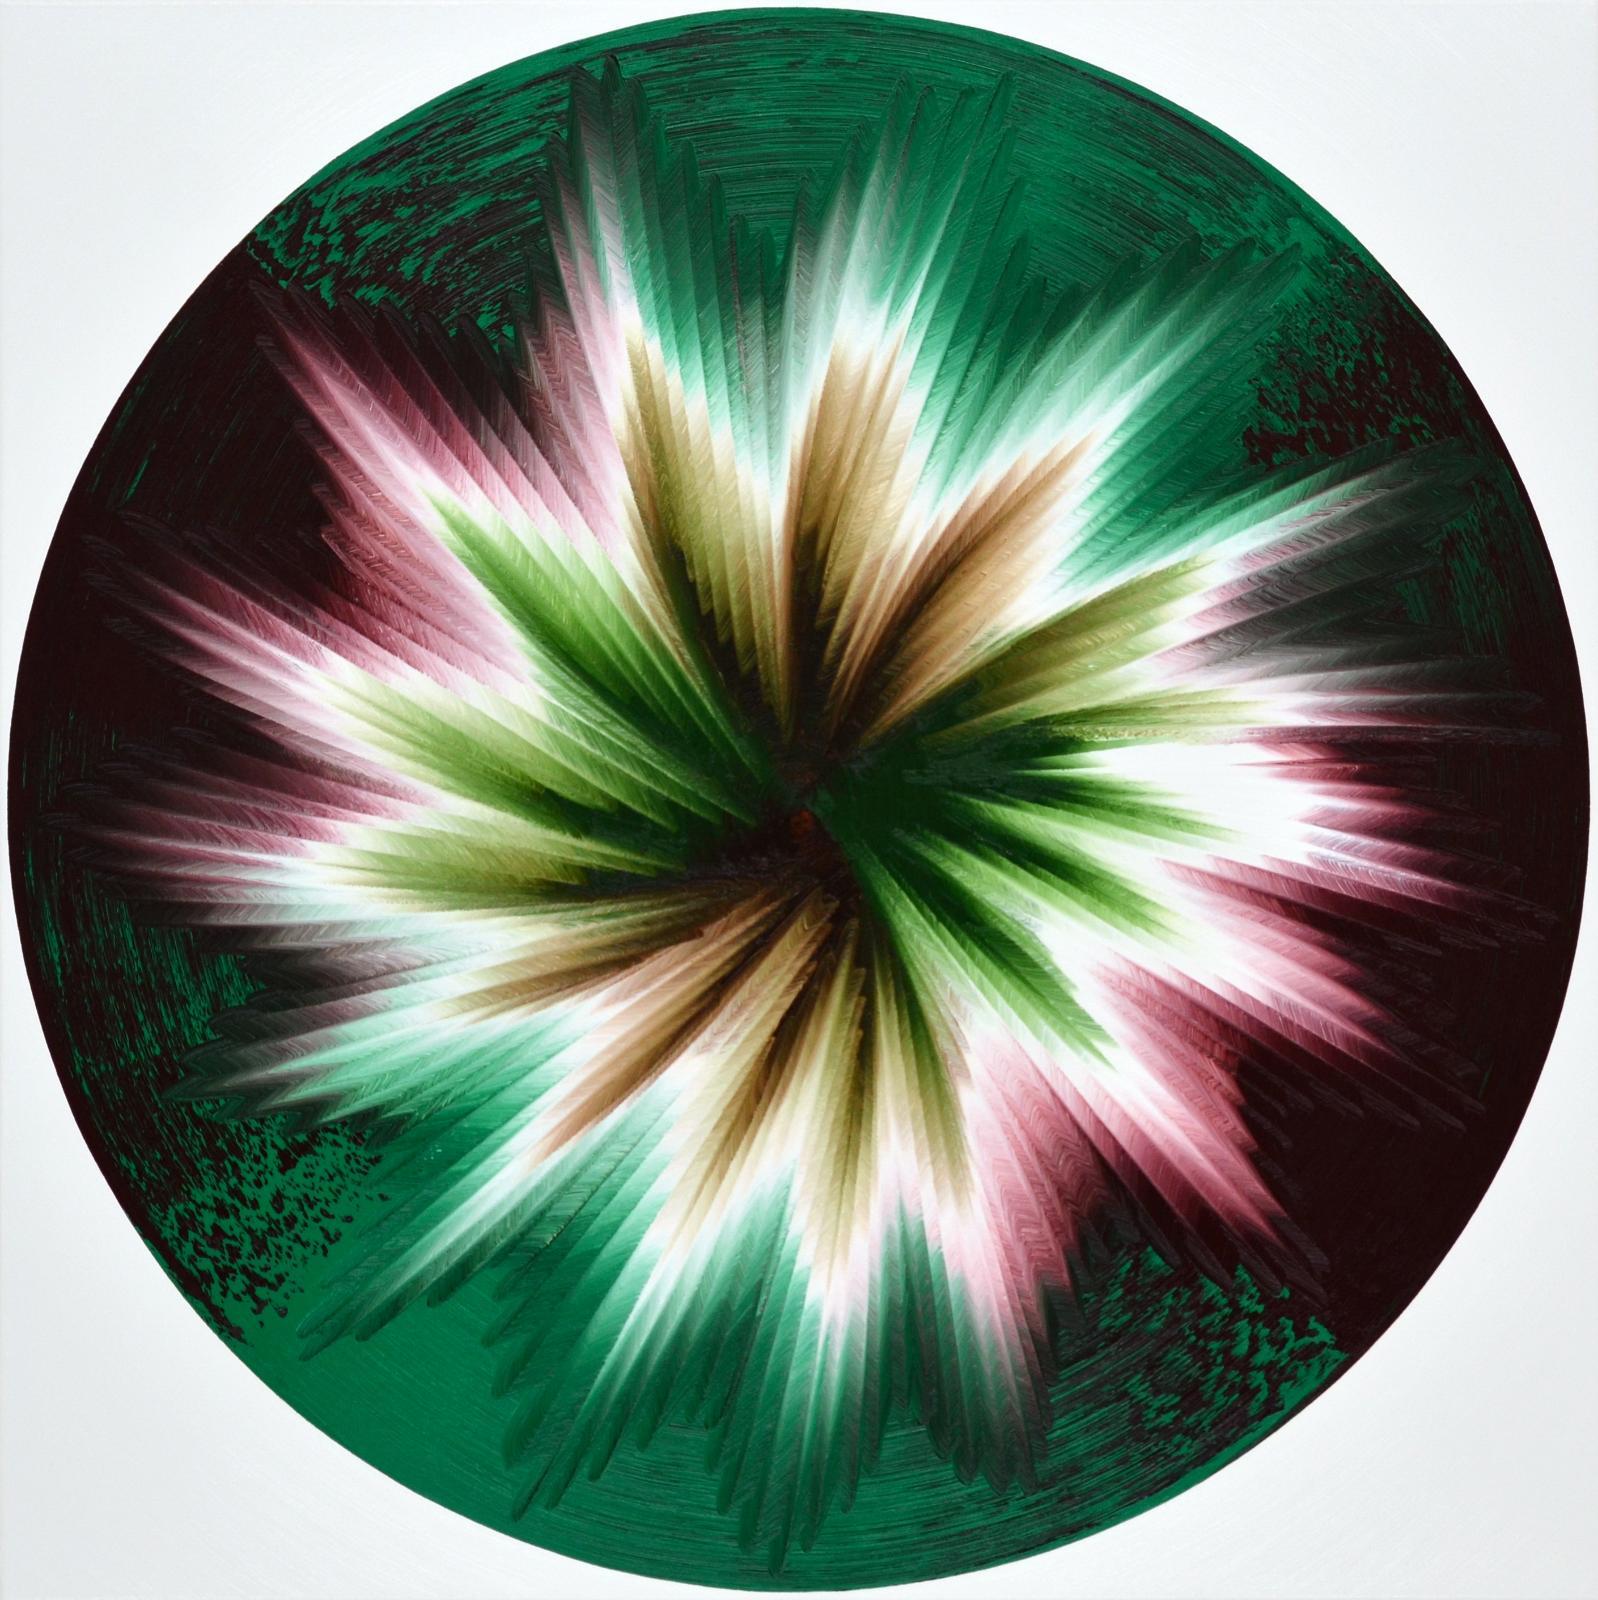 Vera Leutloff Circular Oszillation: Park 2020 Öl auf Leinwand 100 cm x 100 cm Preis auf Anfrage, lev004de